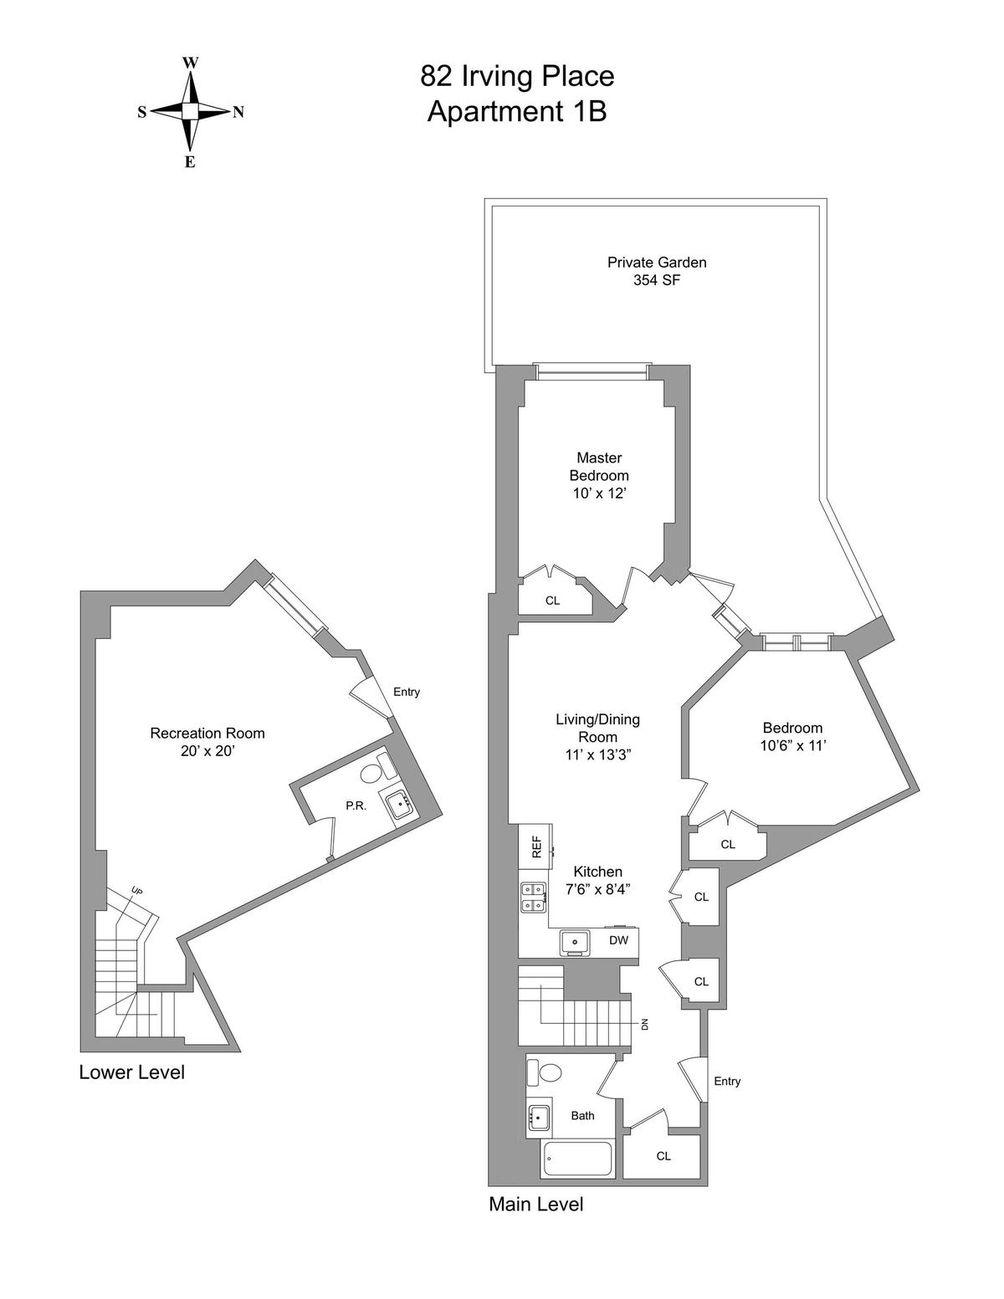 82 Irving Place #1B floor plan